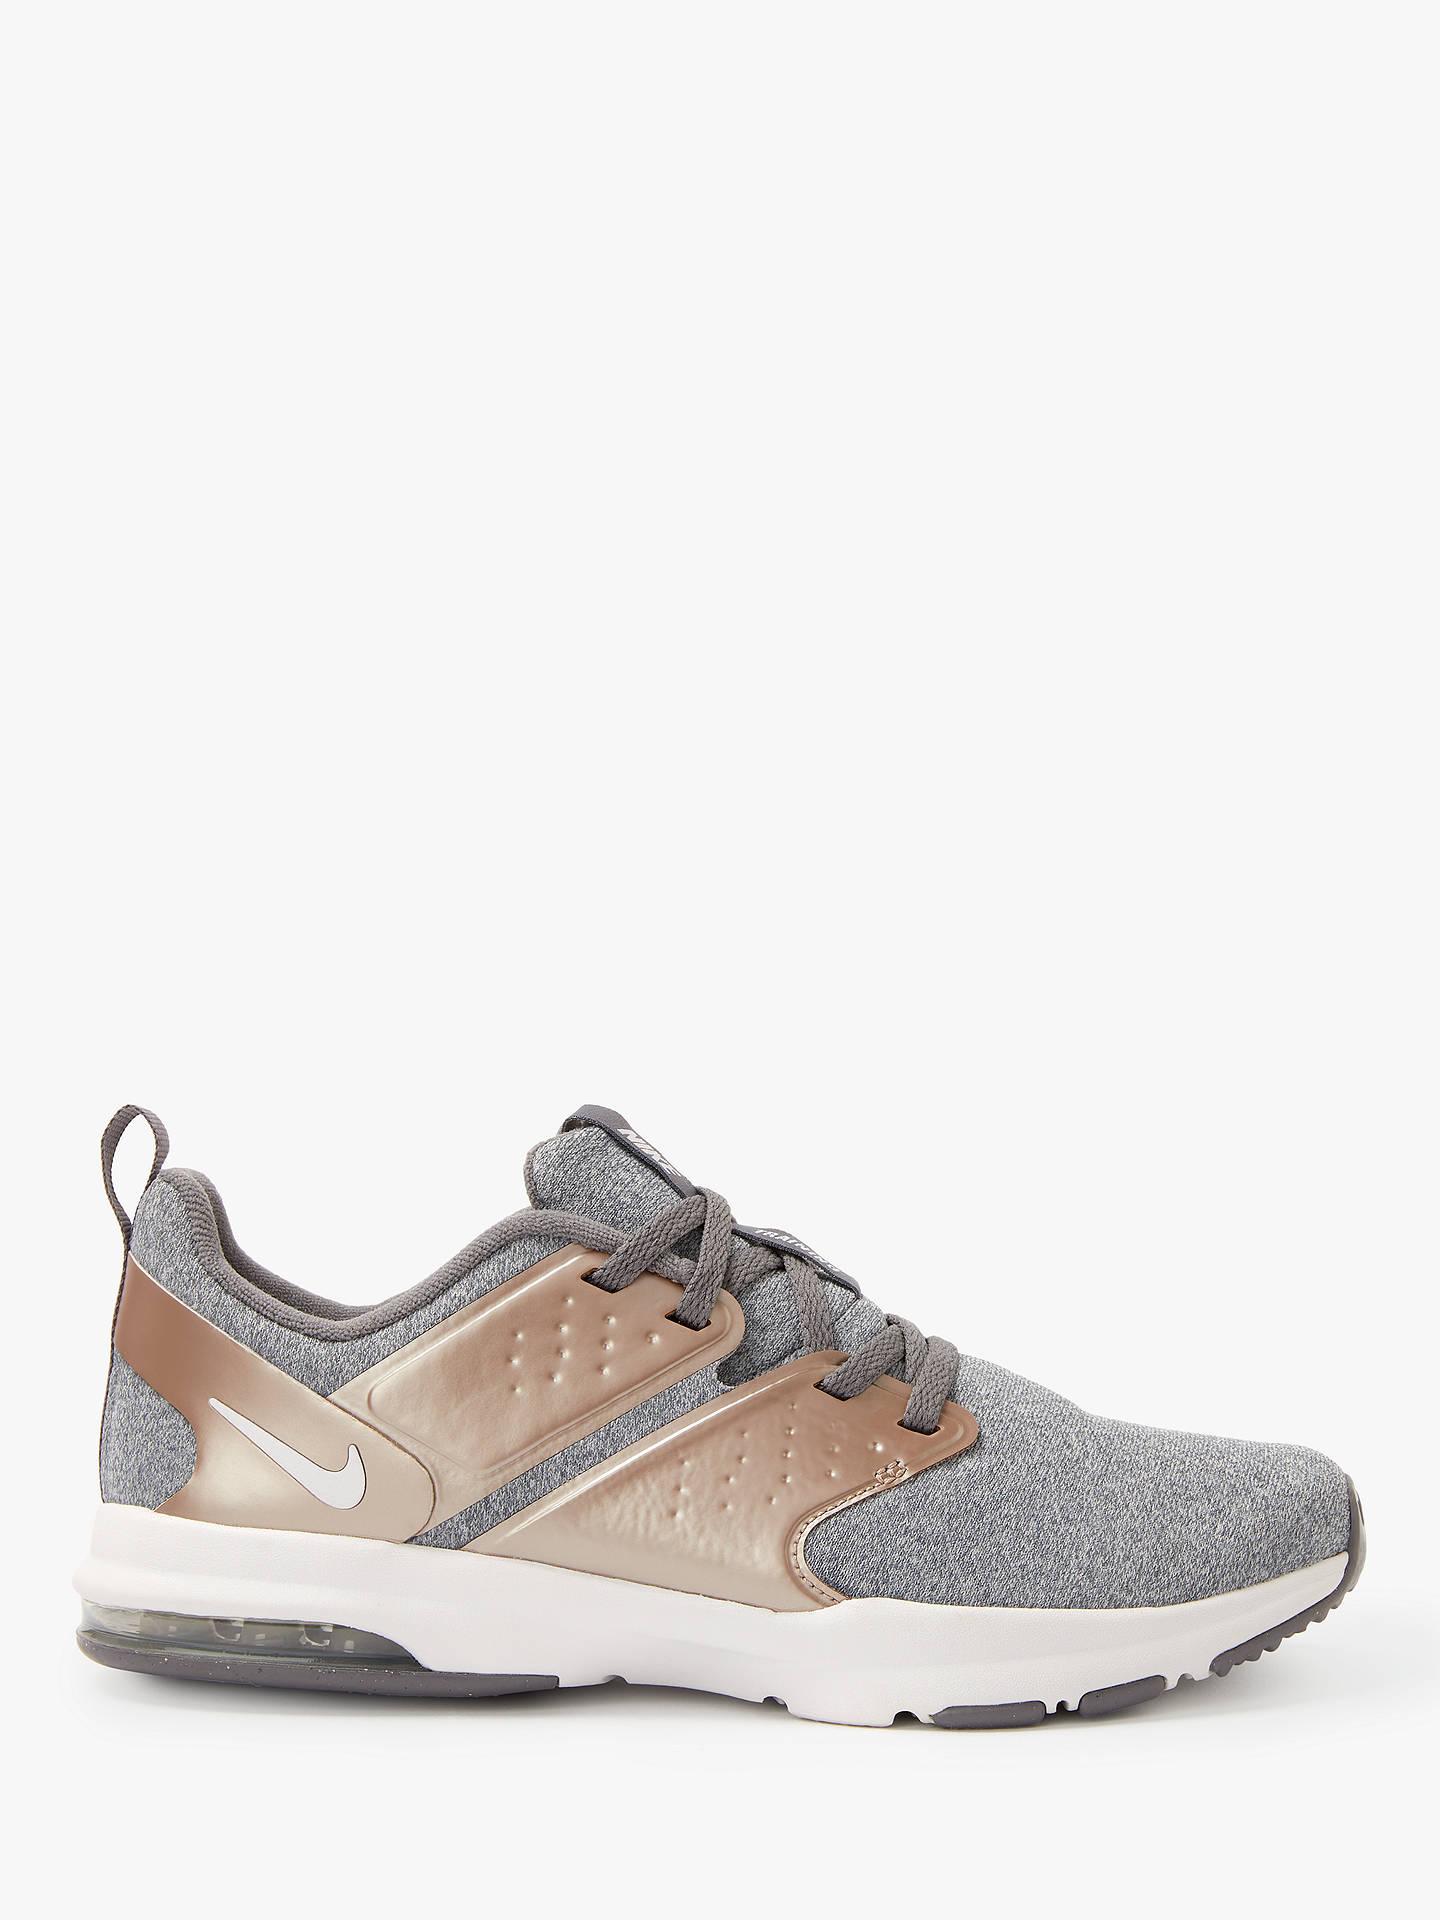 timeless design 60515 25e13 Buy Nike Air Bella TR Premium Women s Training Shoes, Gunsmoke Vast Grey, 4  ...